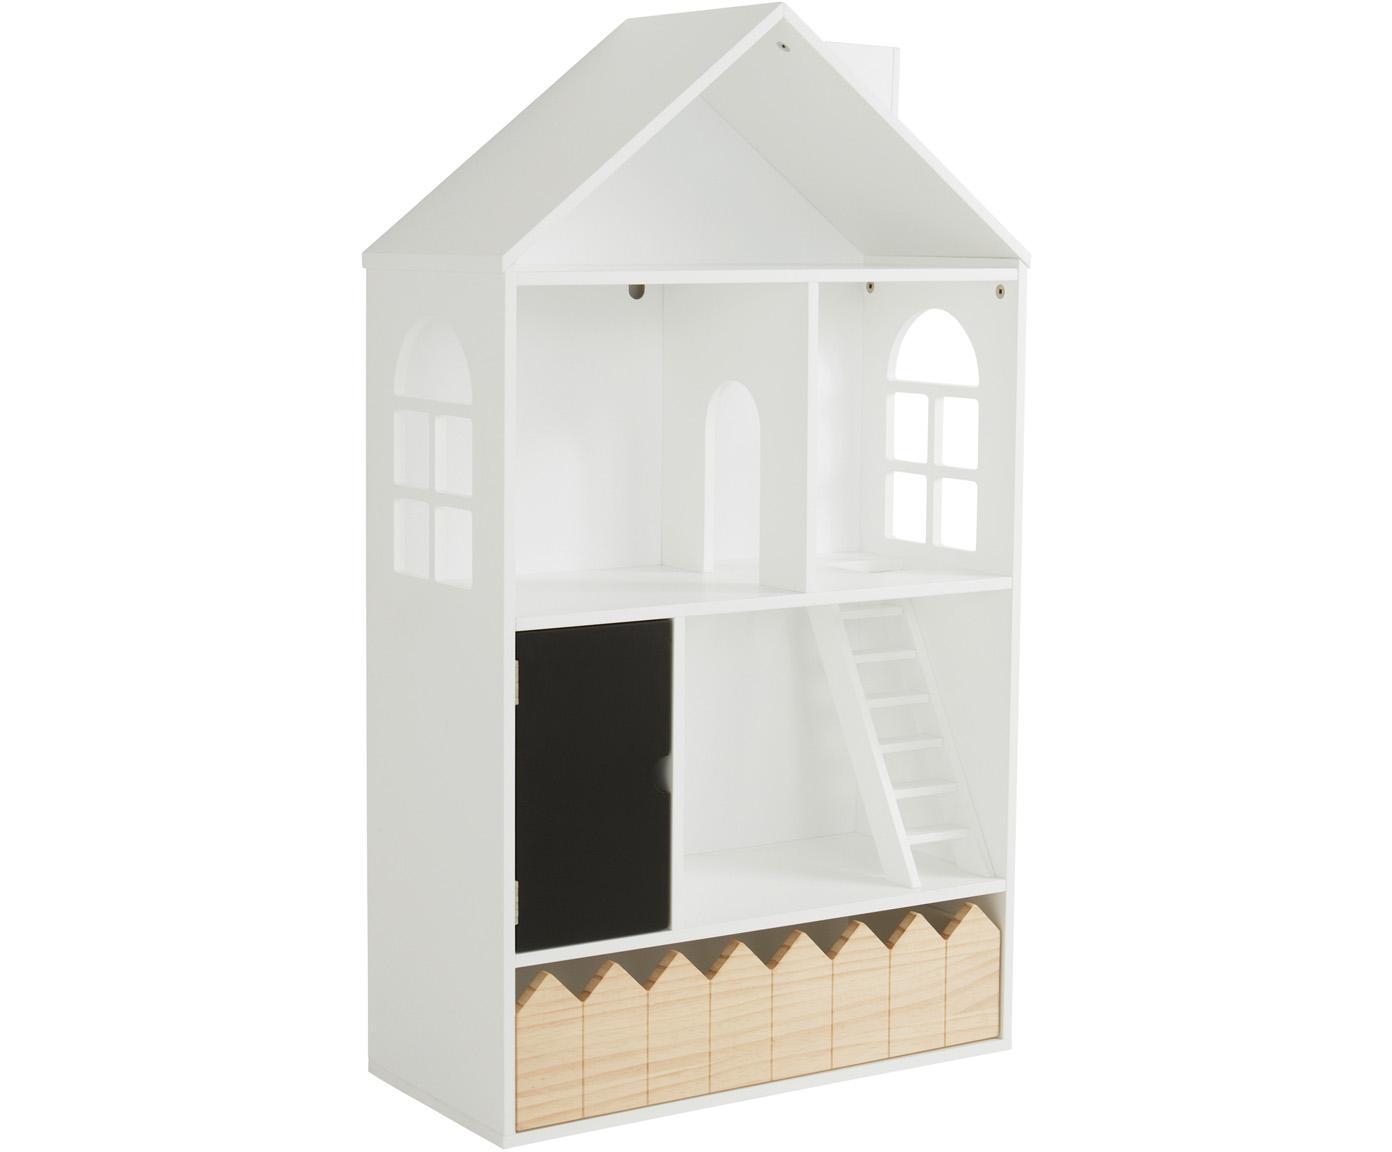 Speelhuis Mi Casa Su Casa, Grenenhout, MDF, Wit, zwart, 61 x 106 cm